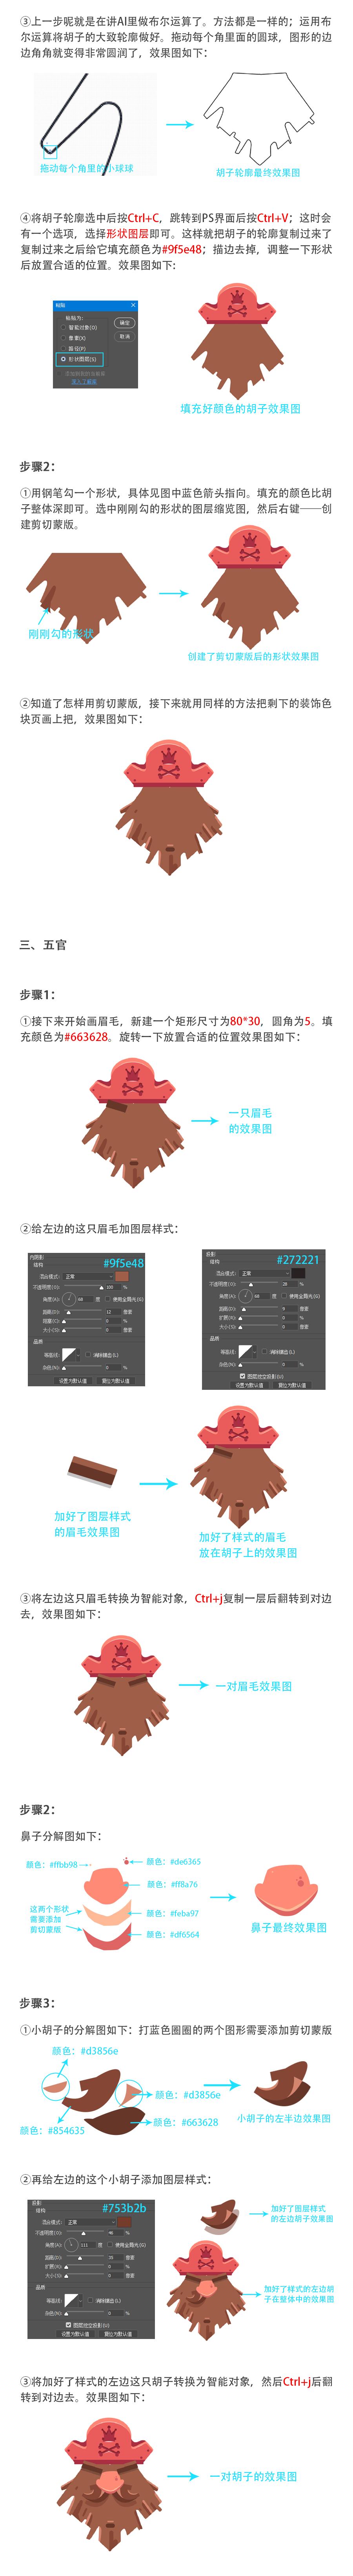 Photoshop繪製矢量風格的海盜插畫教程